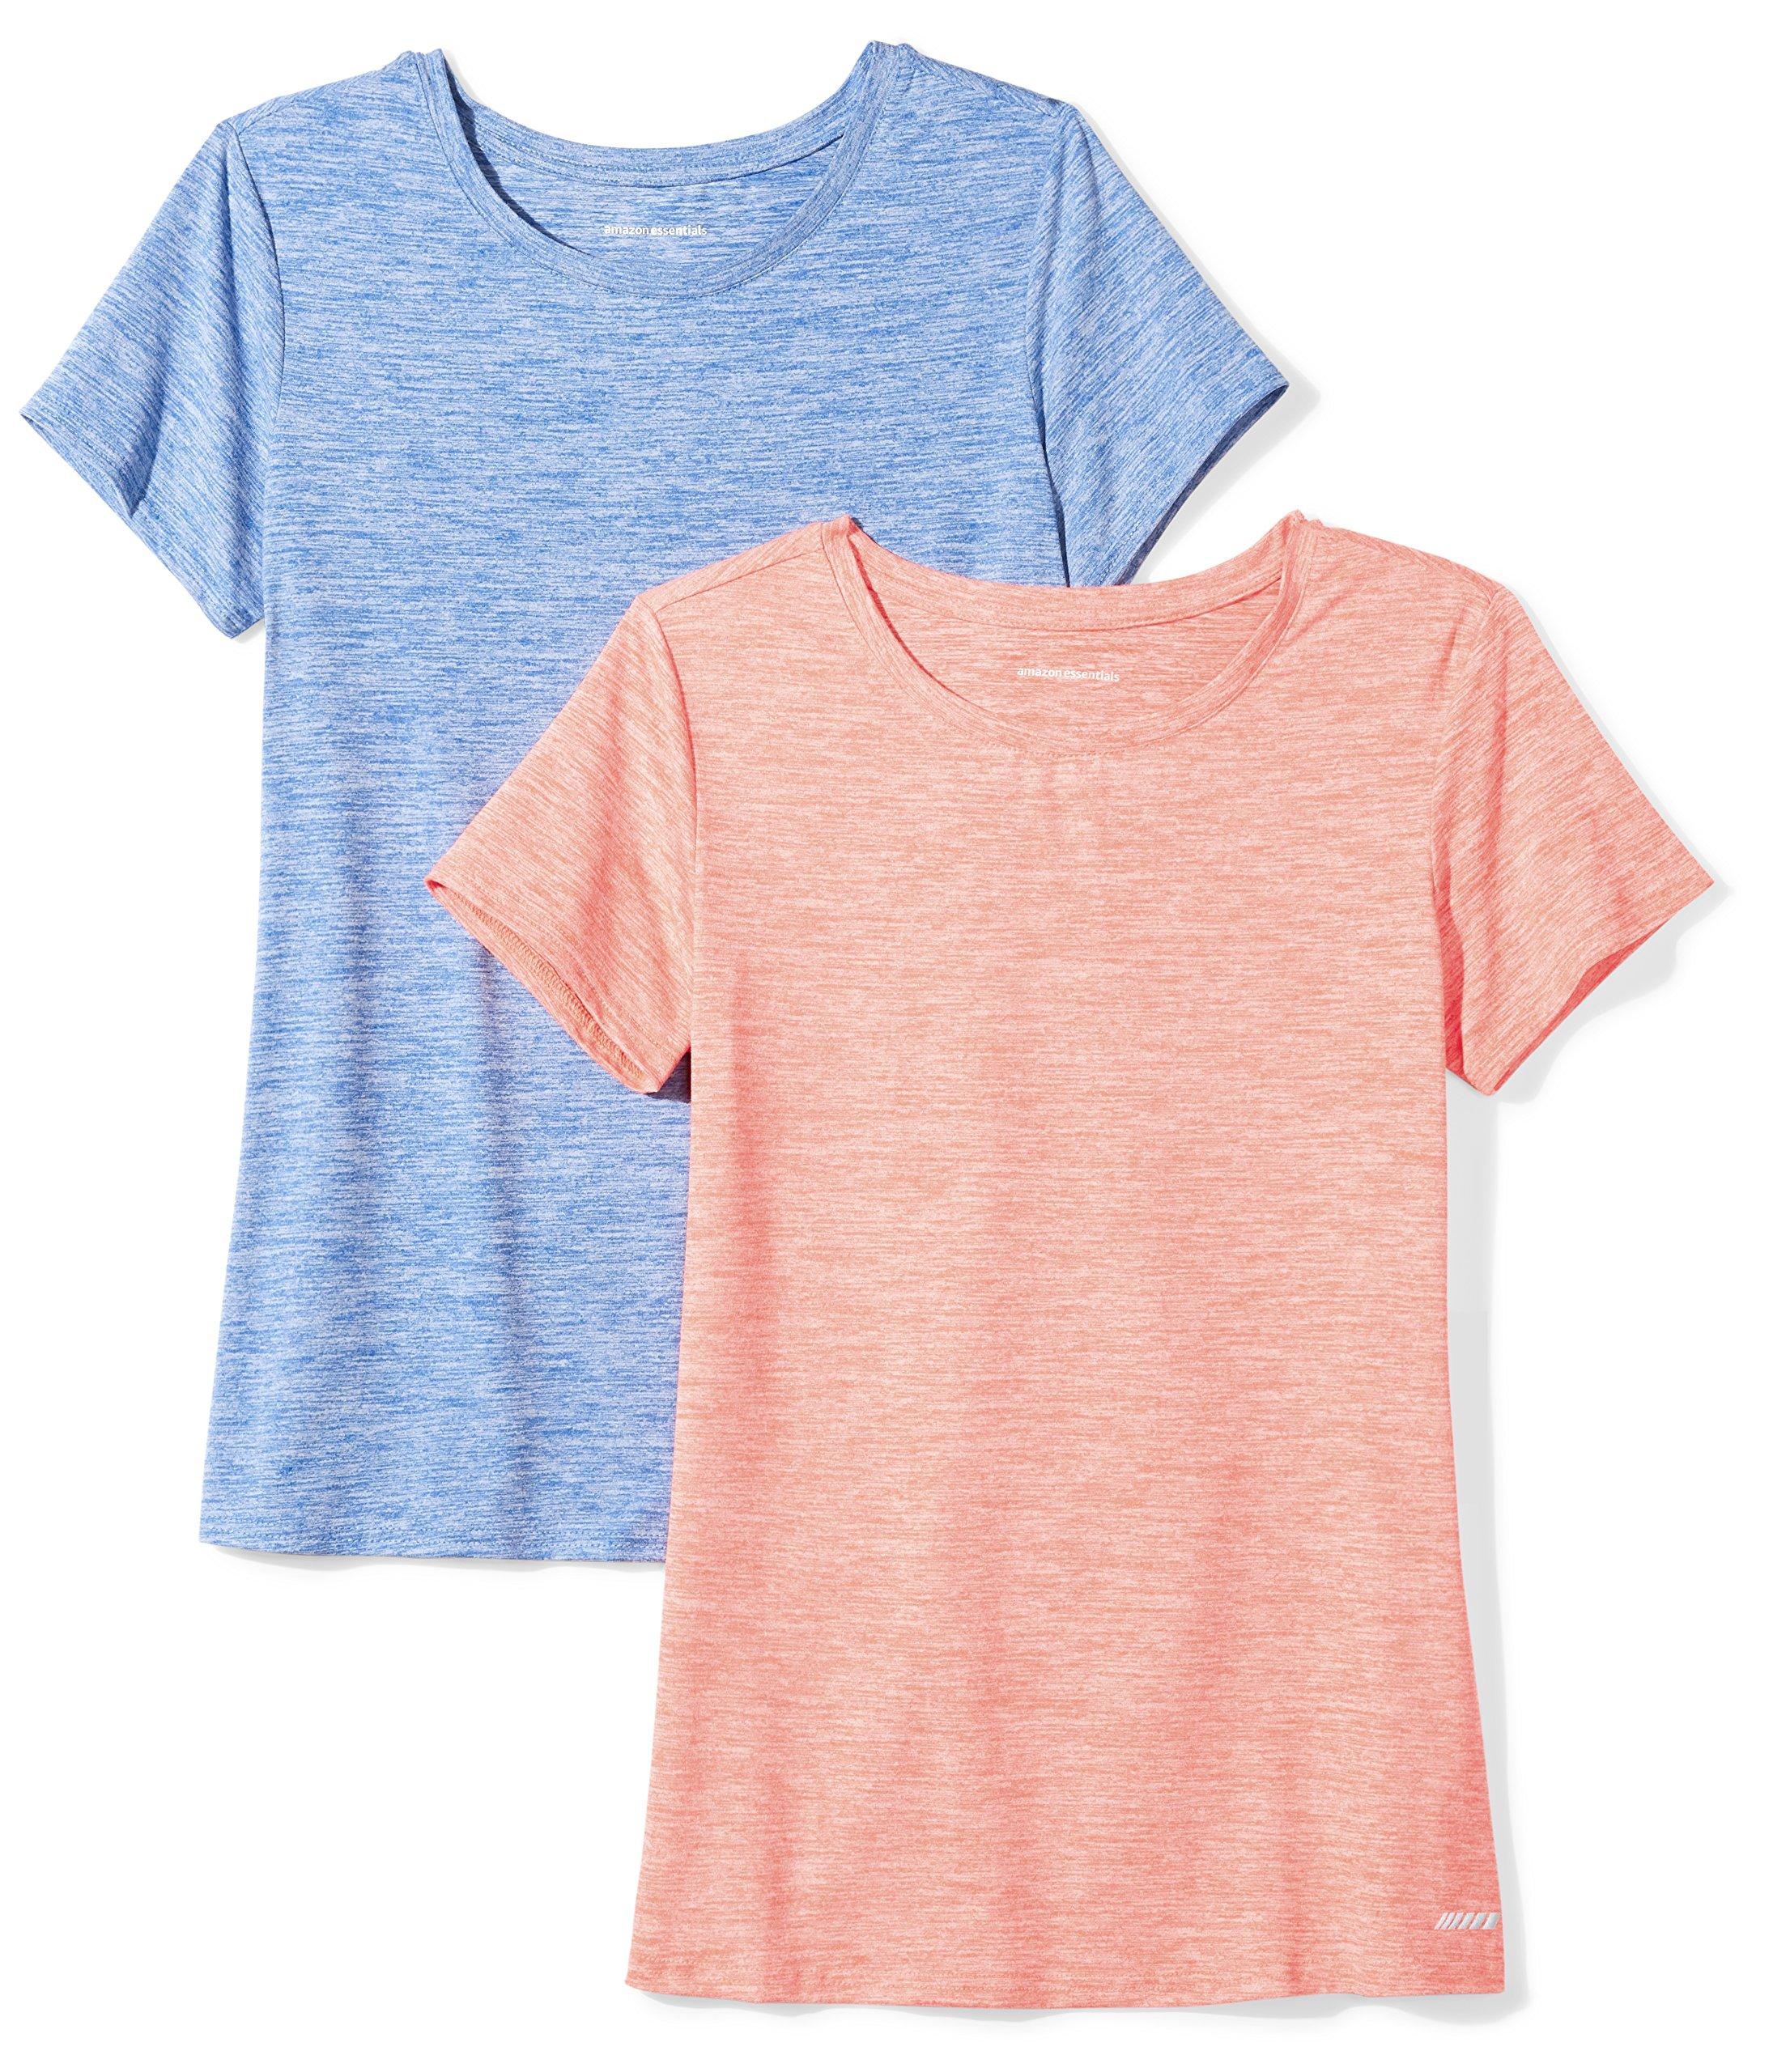 Amazon Essentials Women's 2-Pack Tech Stretch Short-Sleeve Crewneck T-Shirt Shirt, Fiery Coral Heather/Cobalt Heather, Small